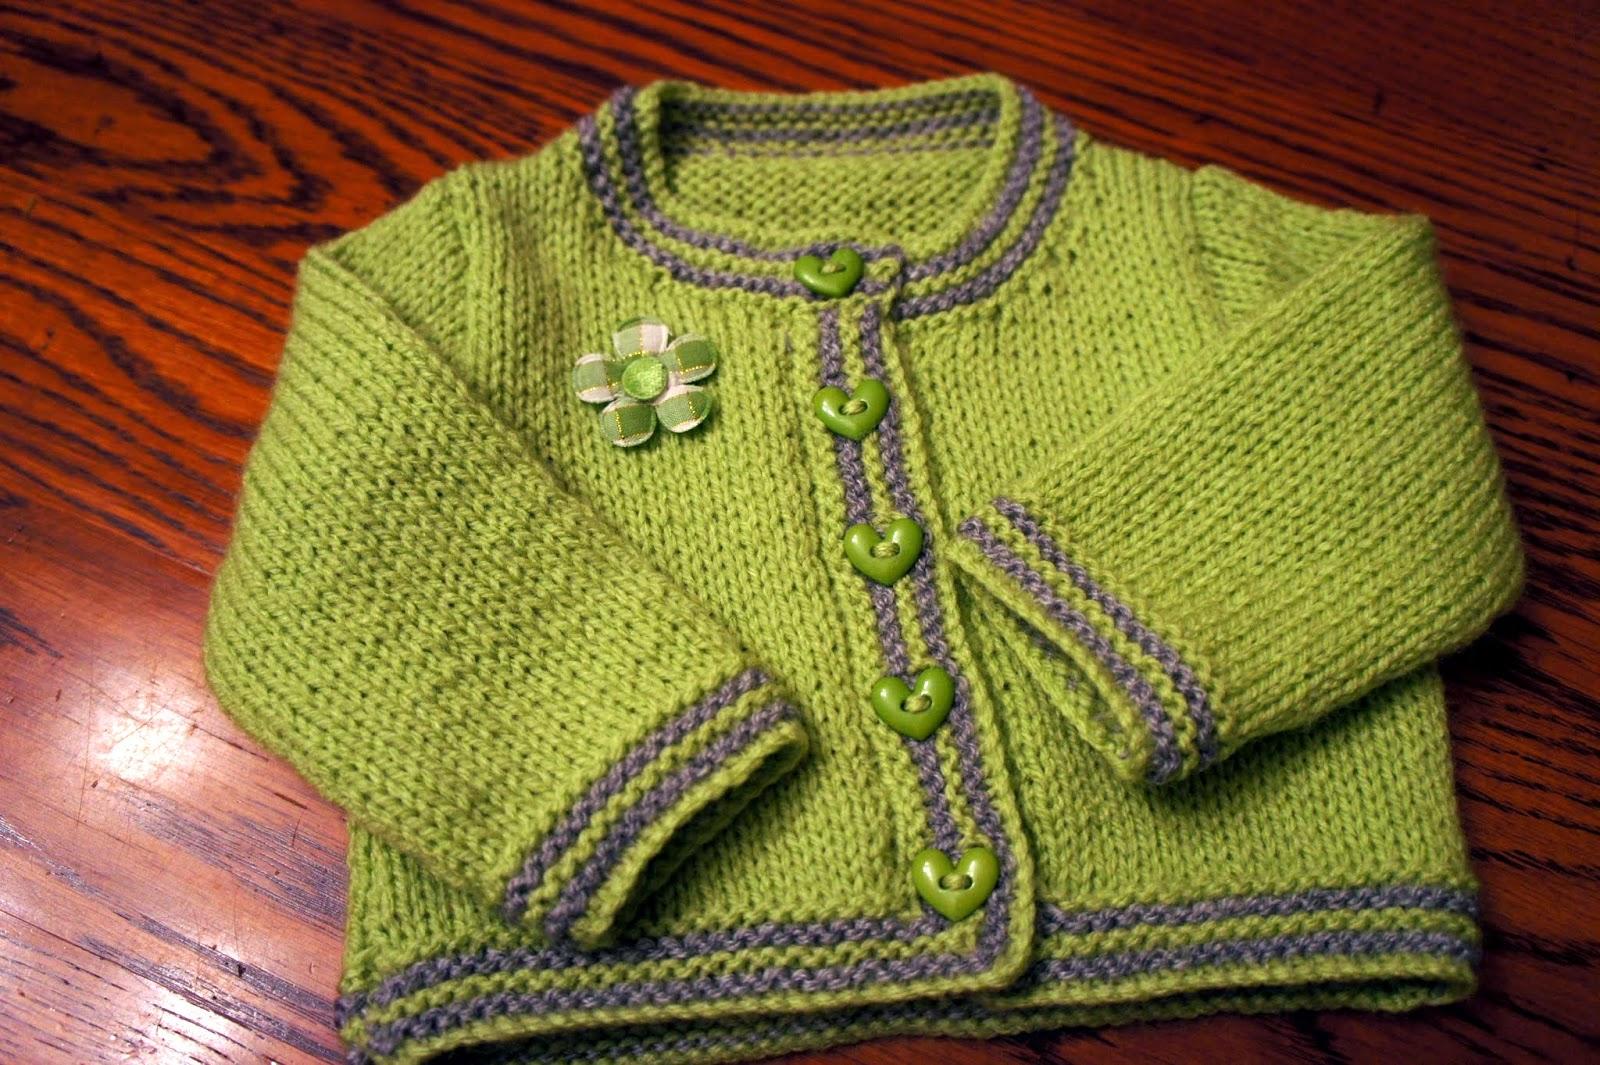 GRANNYS WORLD: Knitting - flying off the needles